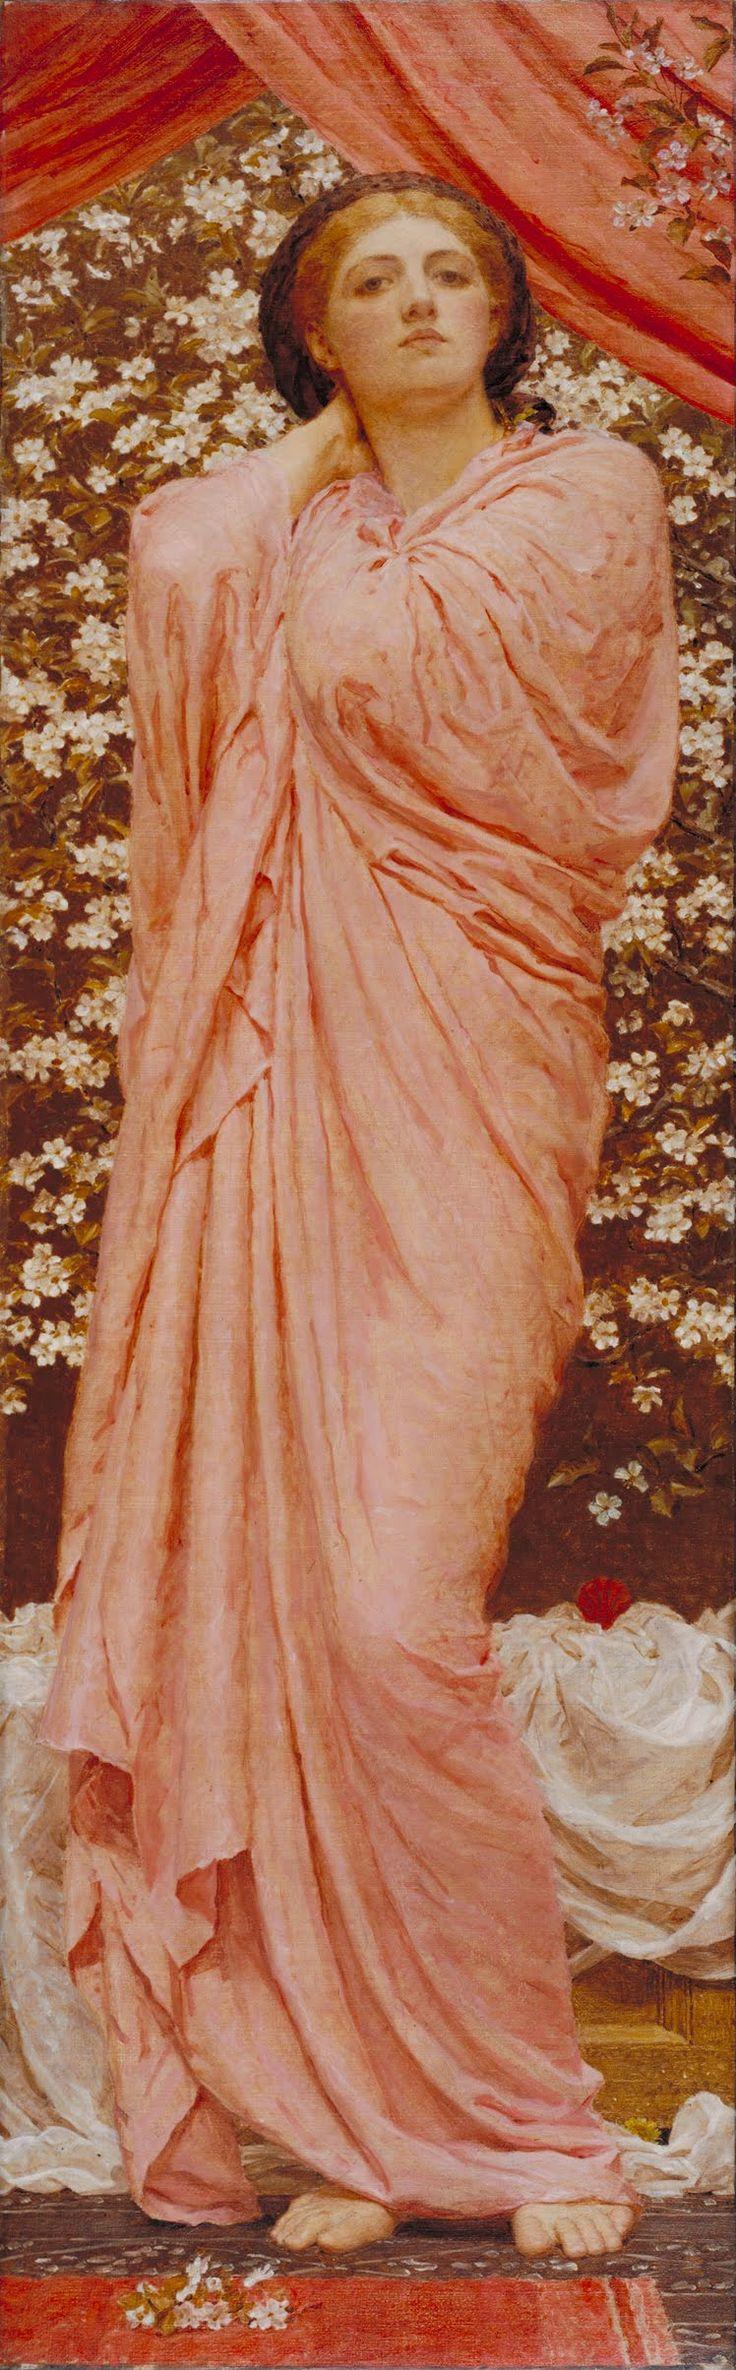 Blossoms - Albert Joseph Moore